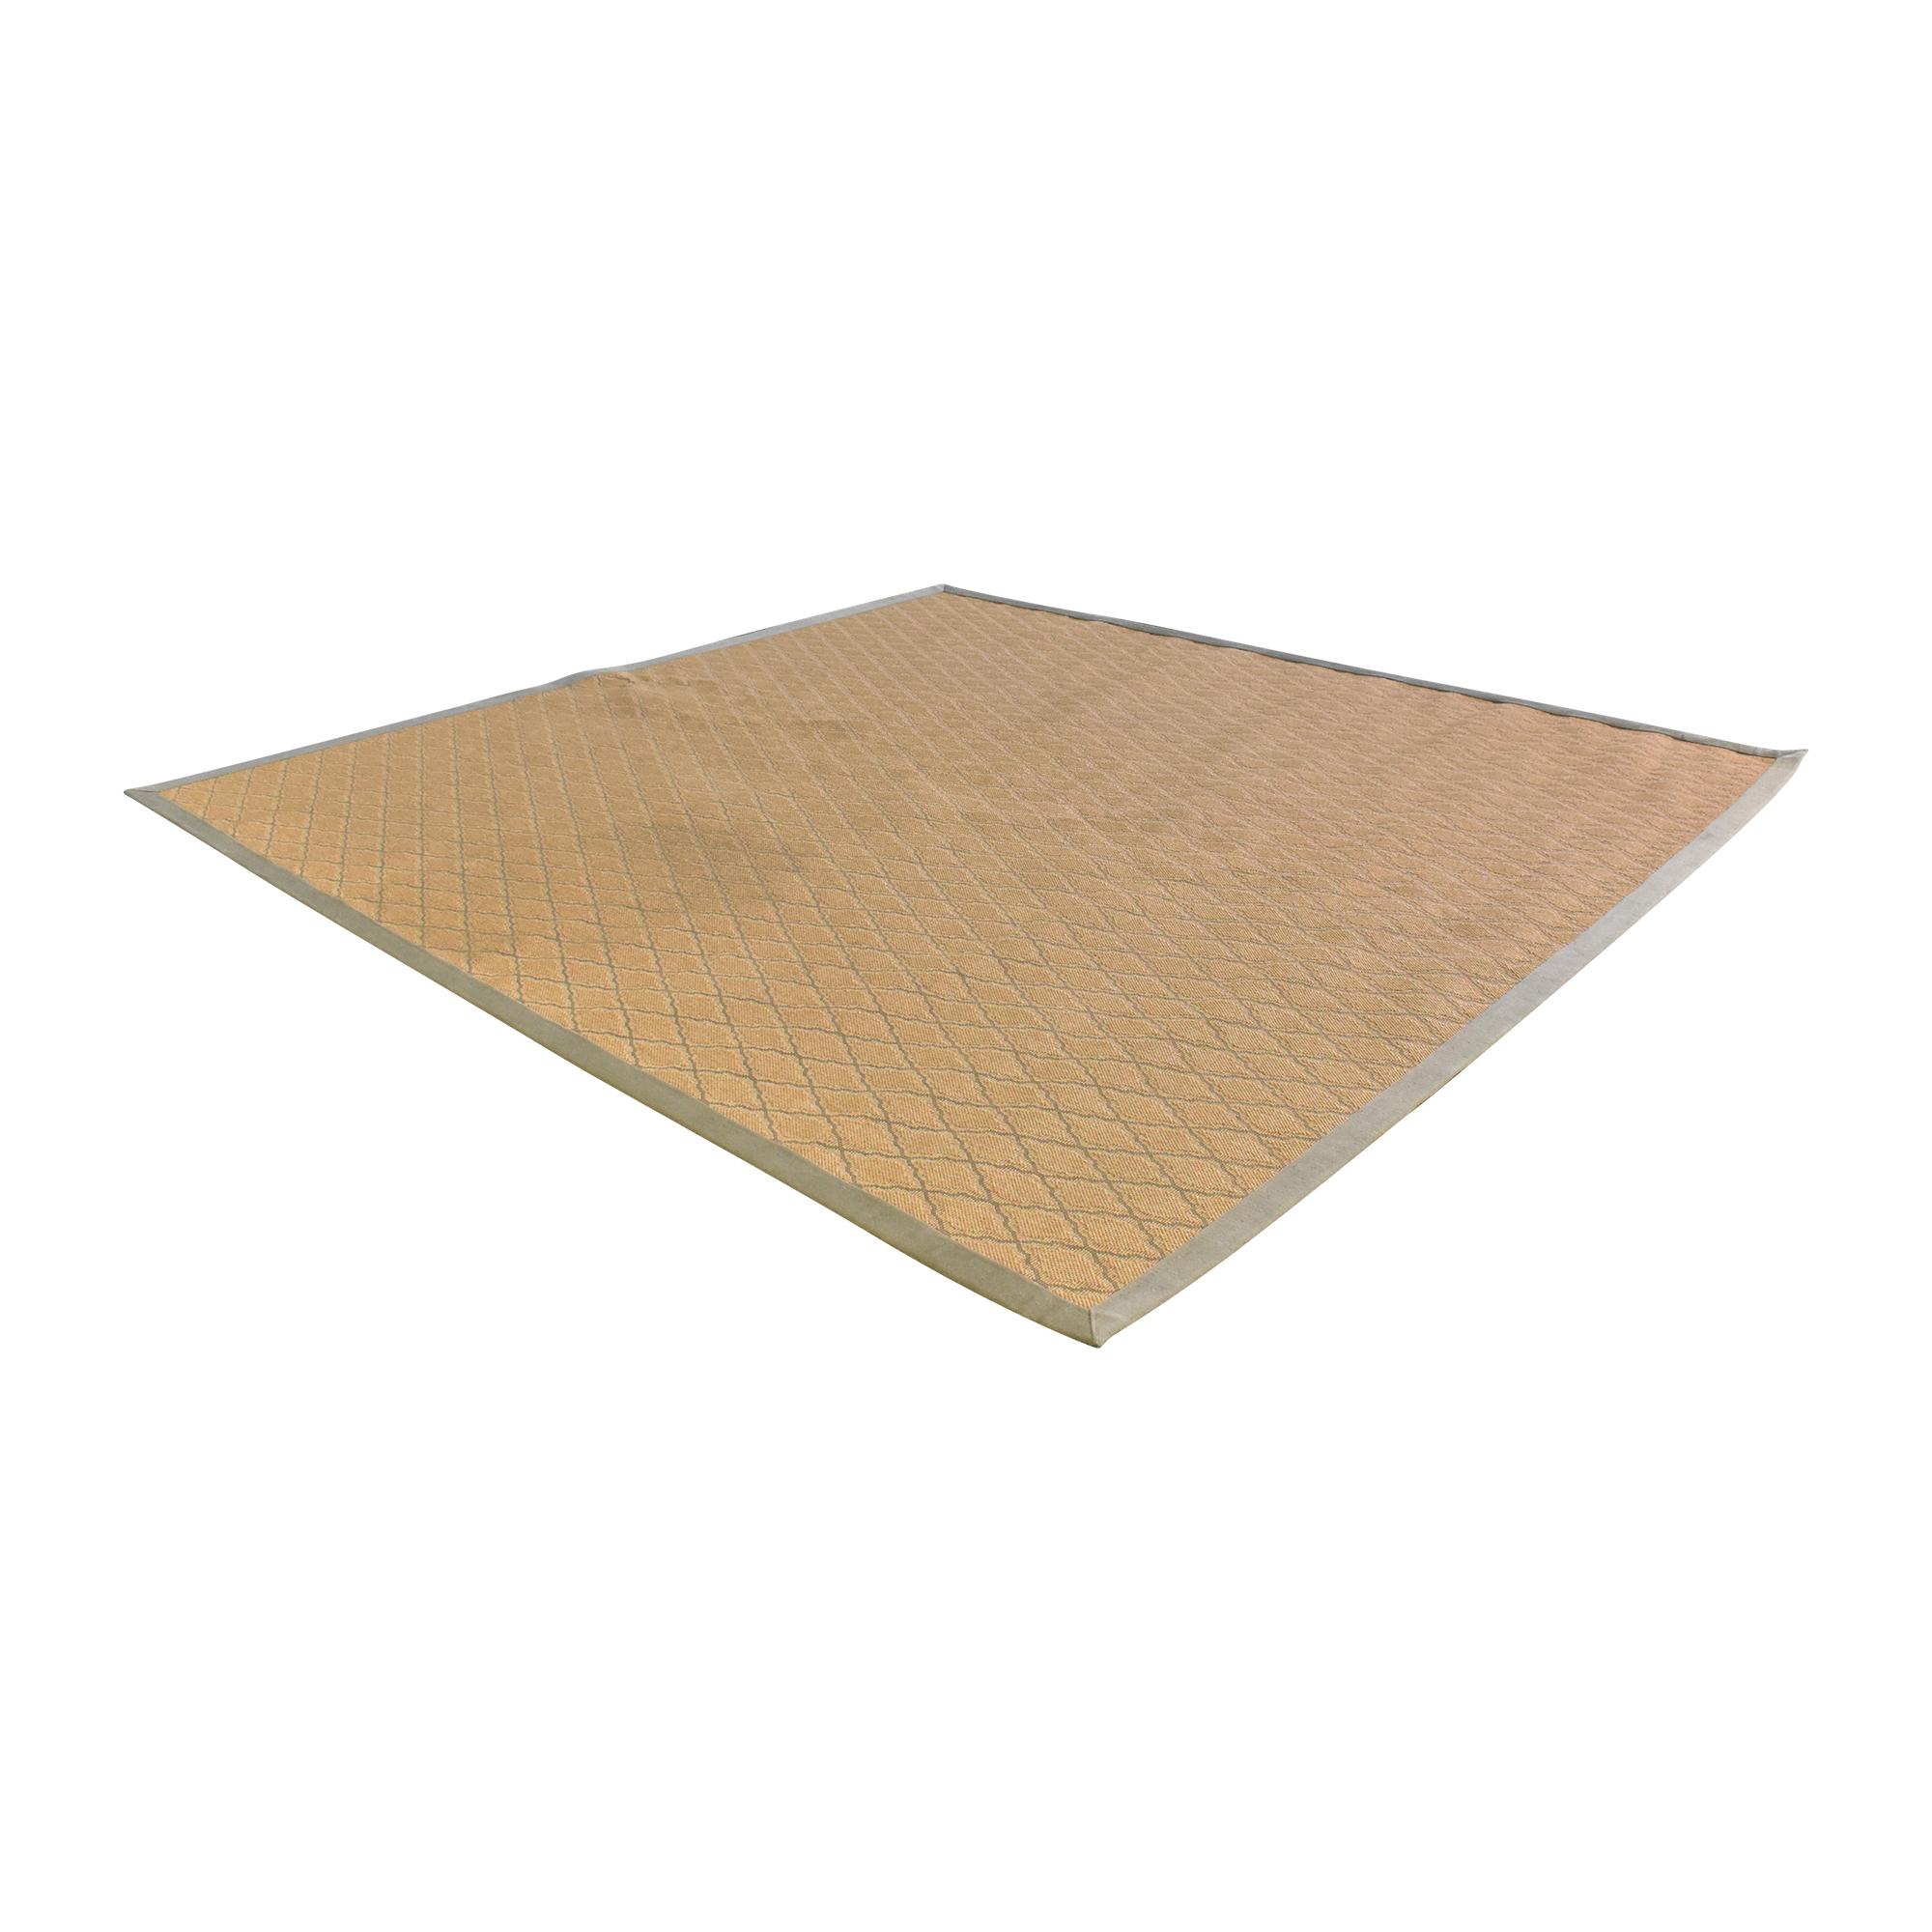 shop ABC Carpet & Home Seychelles Area Rug ABC Carpet & Home Rugs